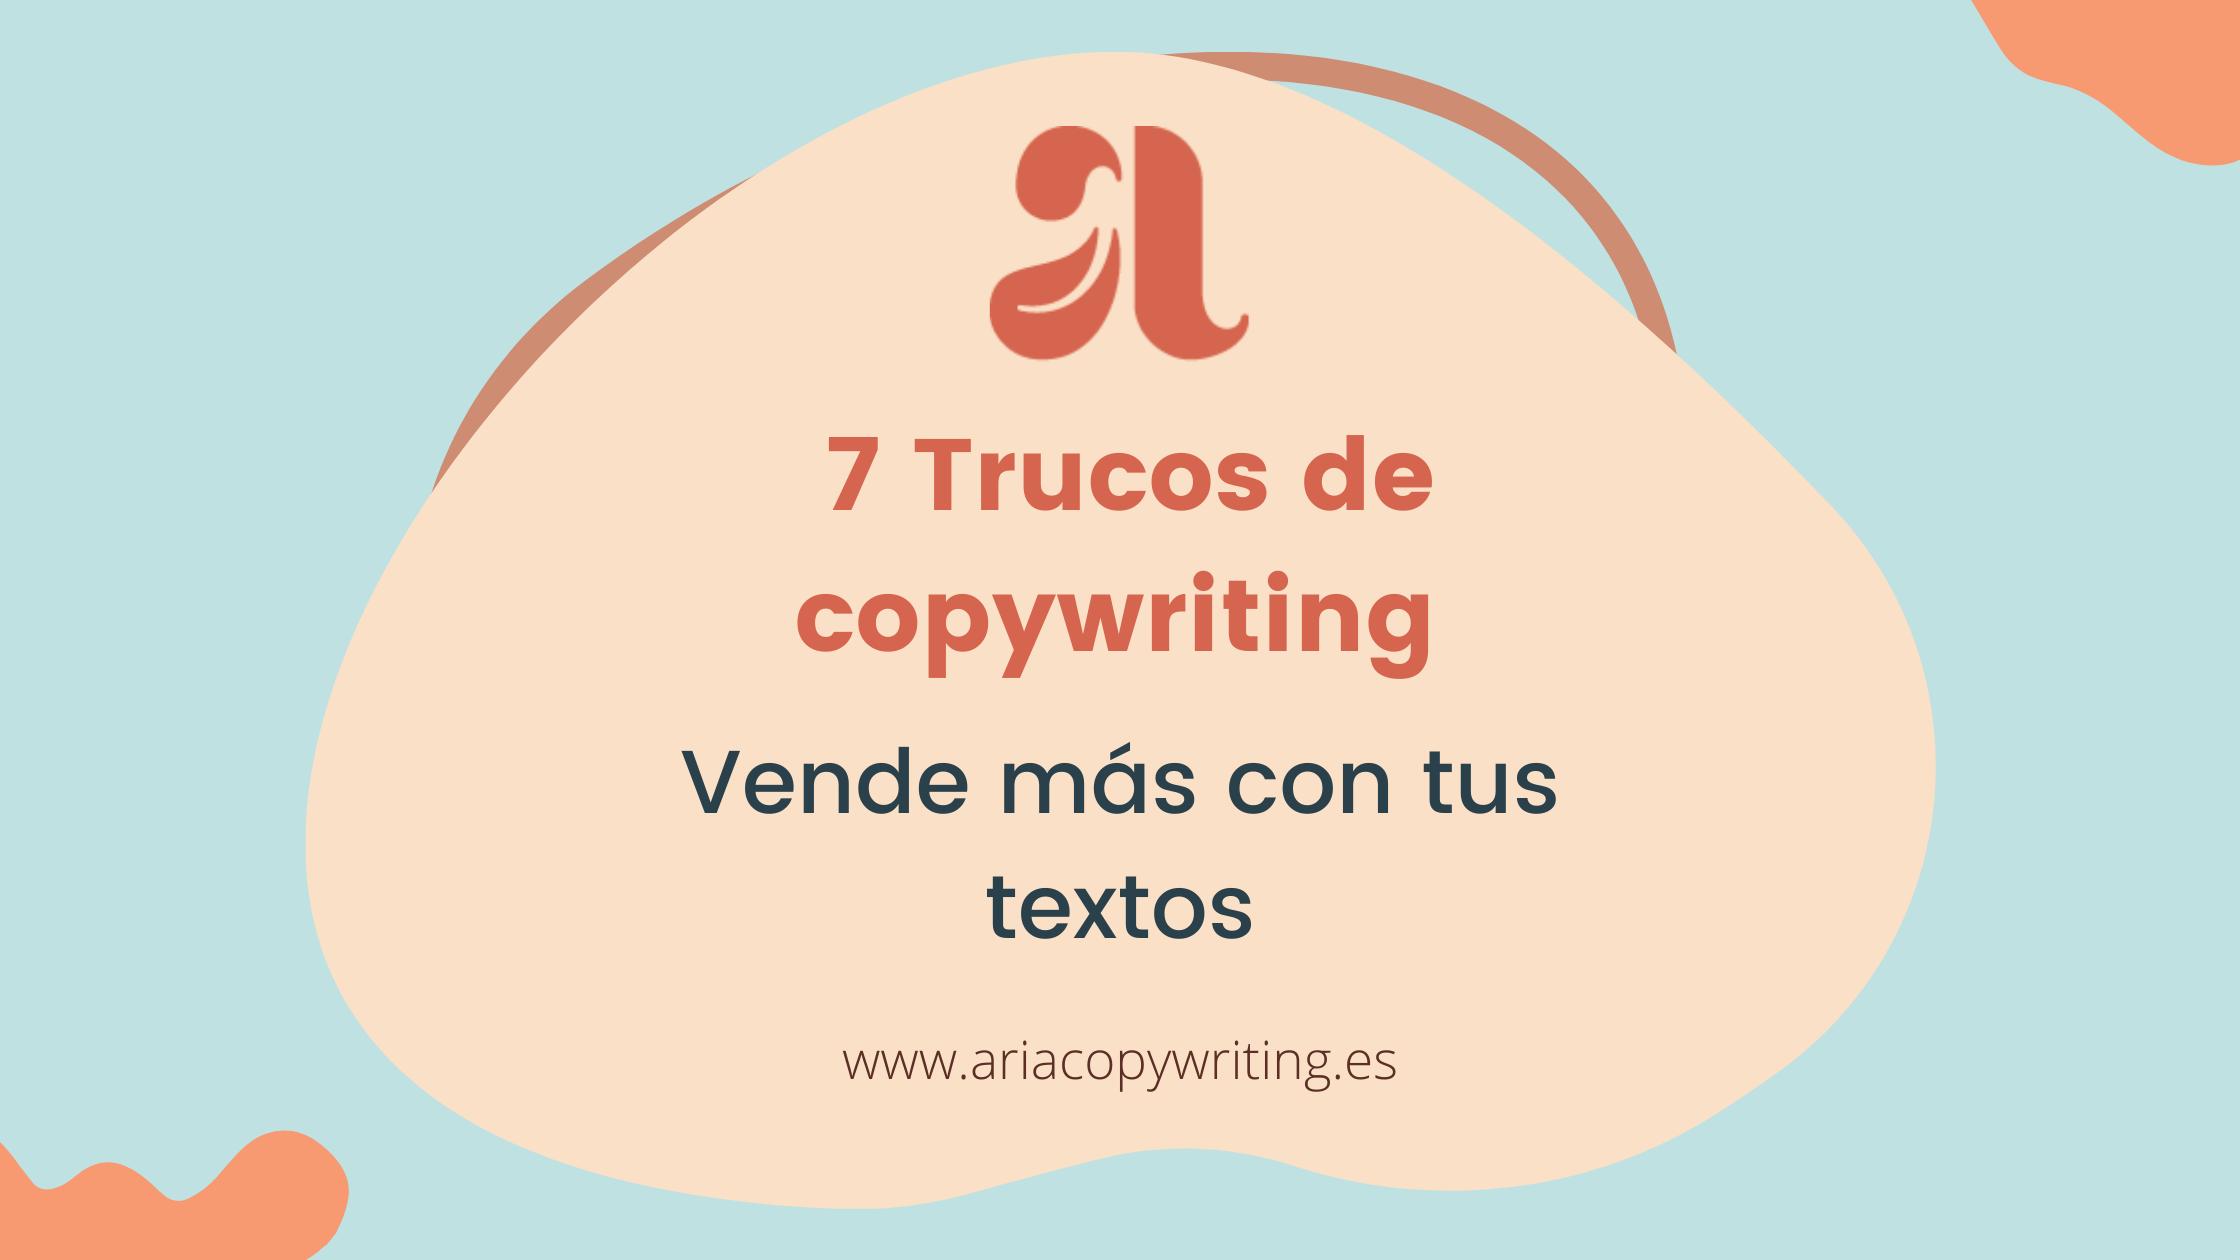 7 Trucos de copywriting para vender mas con tu web